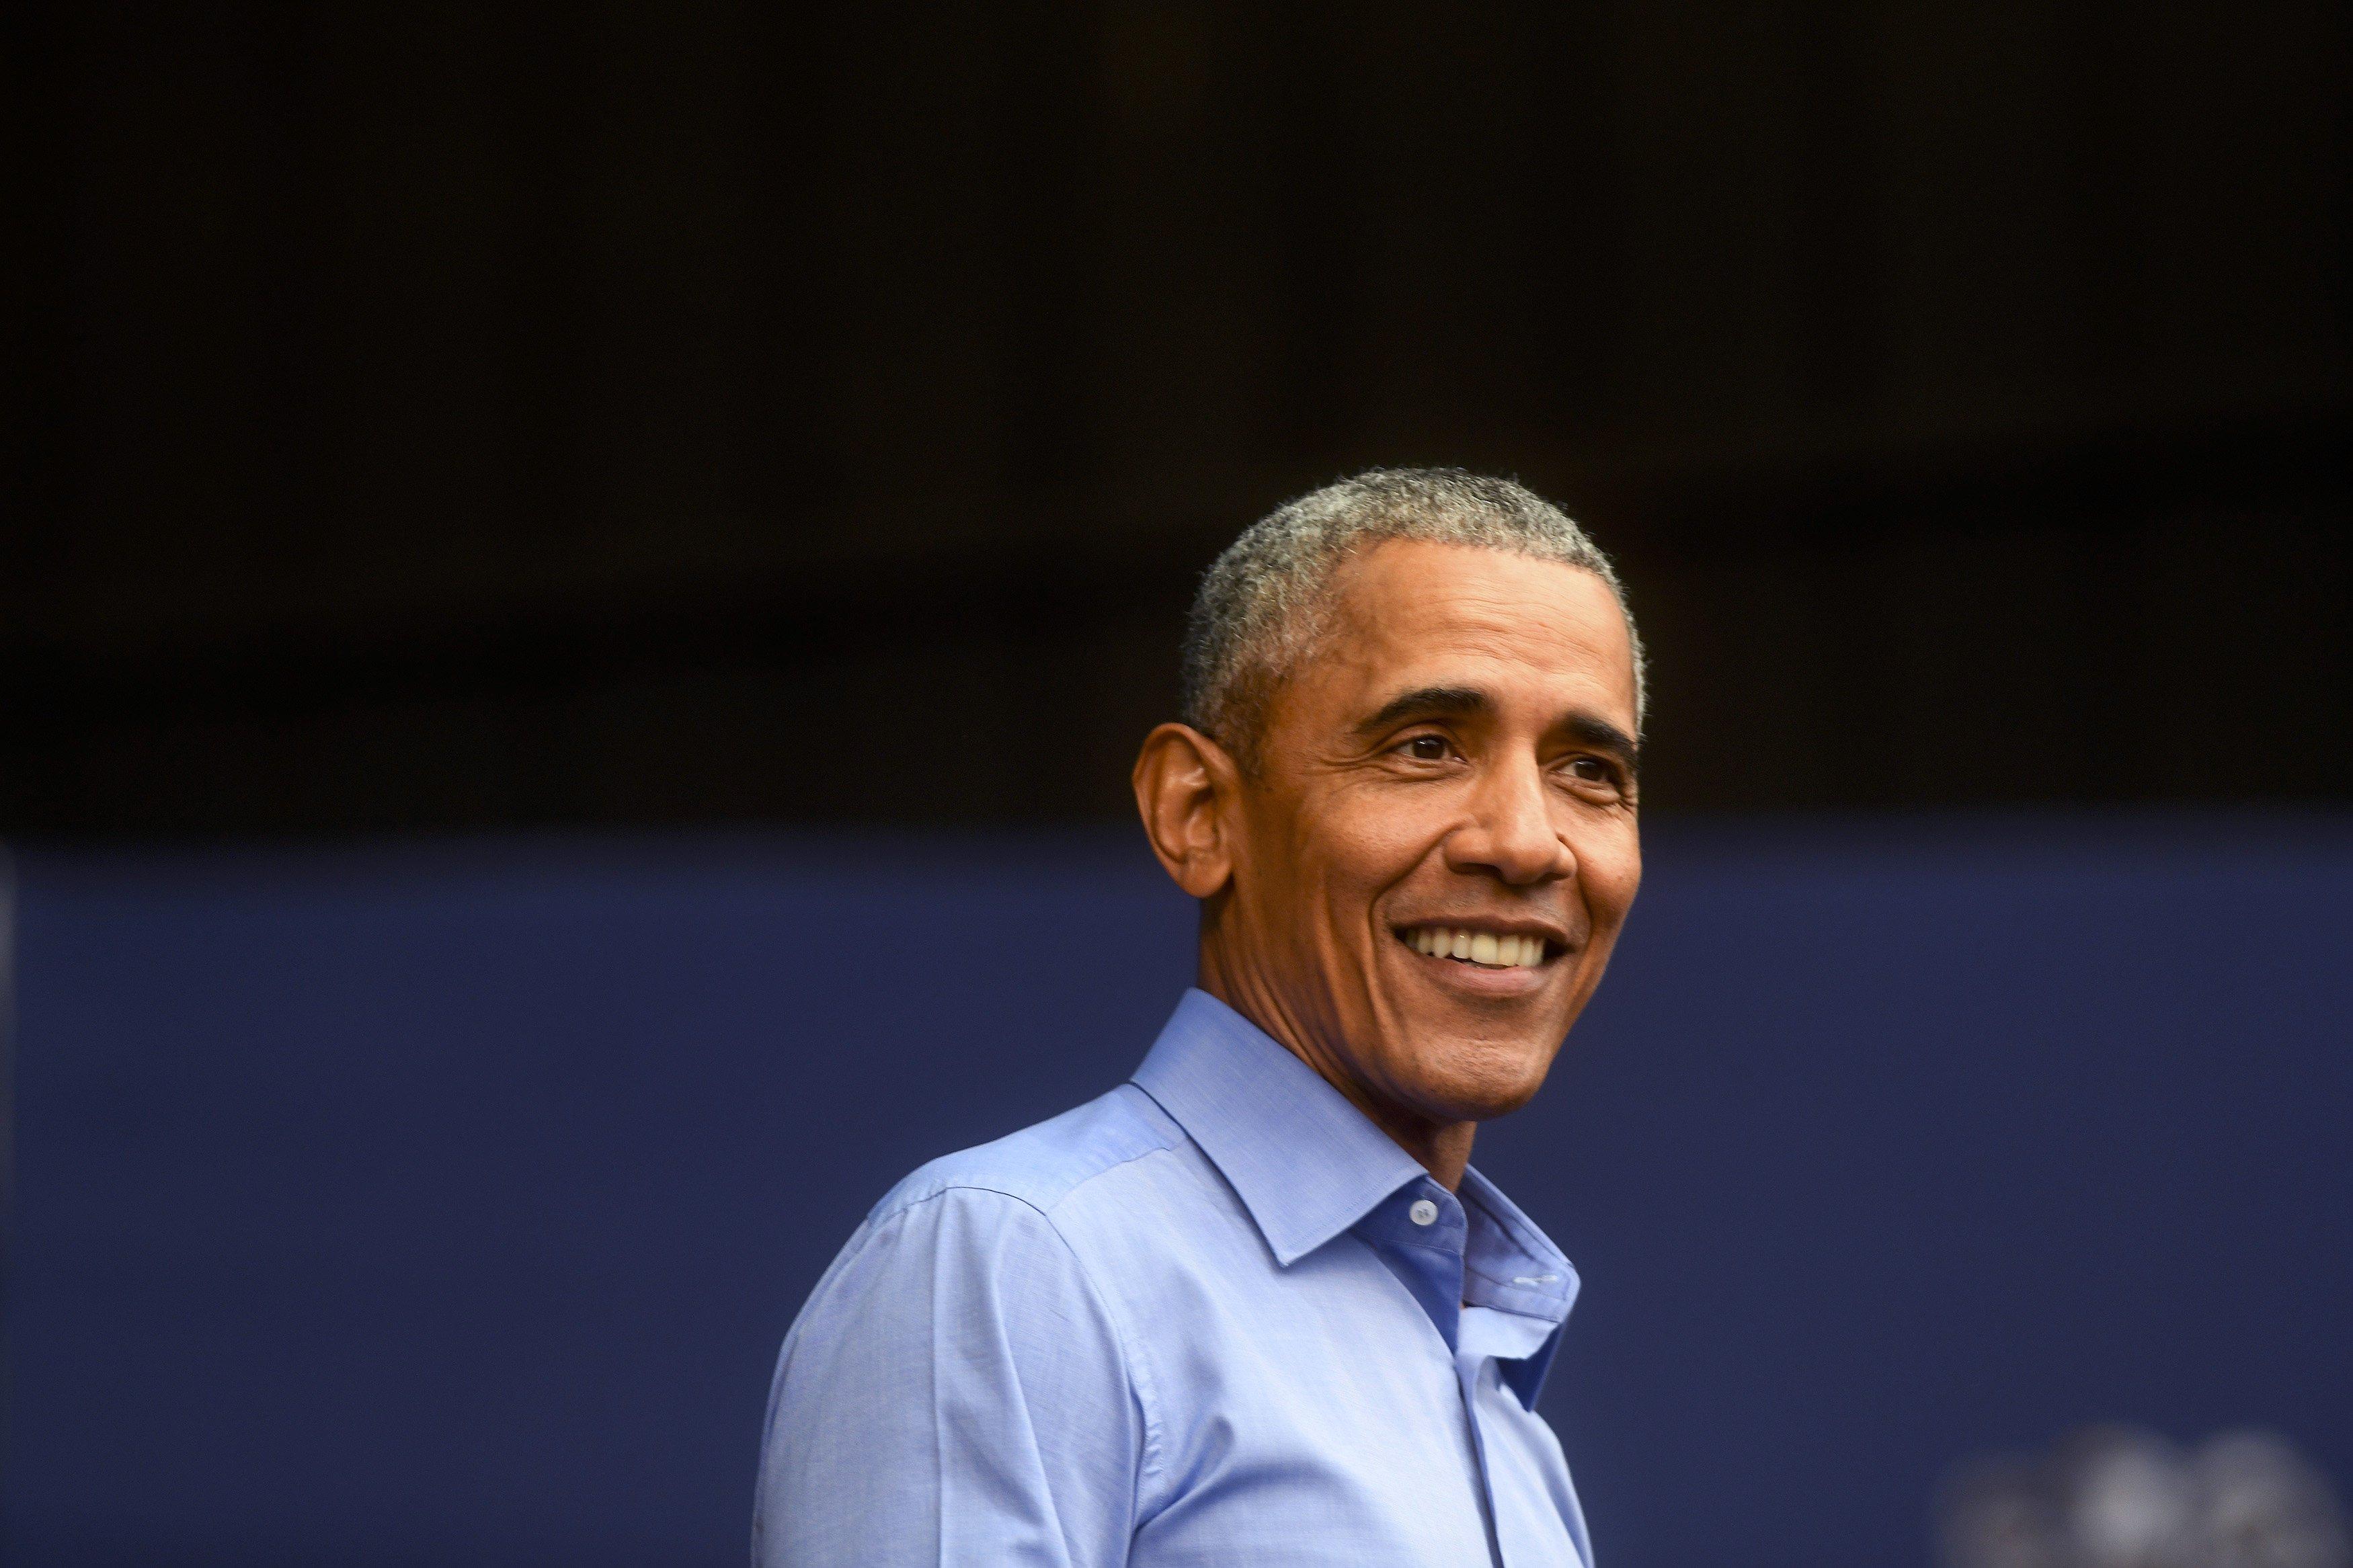 Former President Barack Obama | Photo: Getty Images